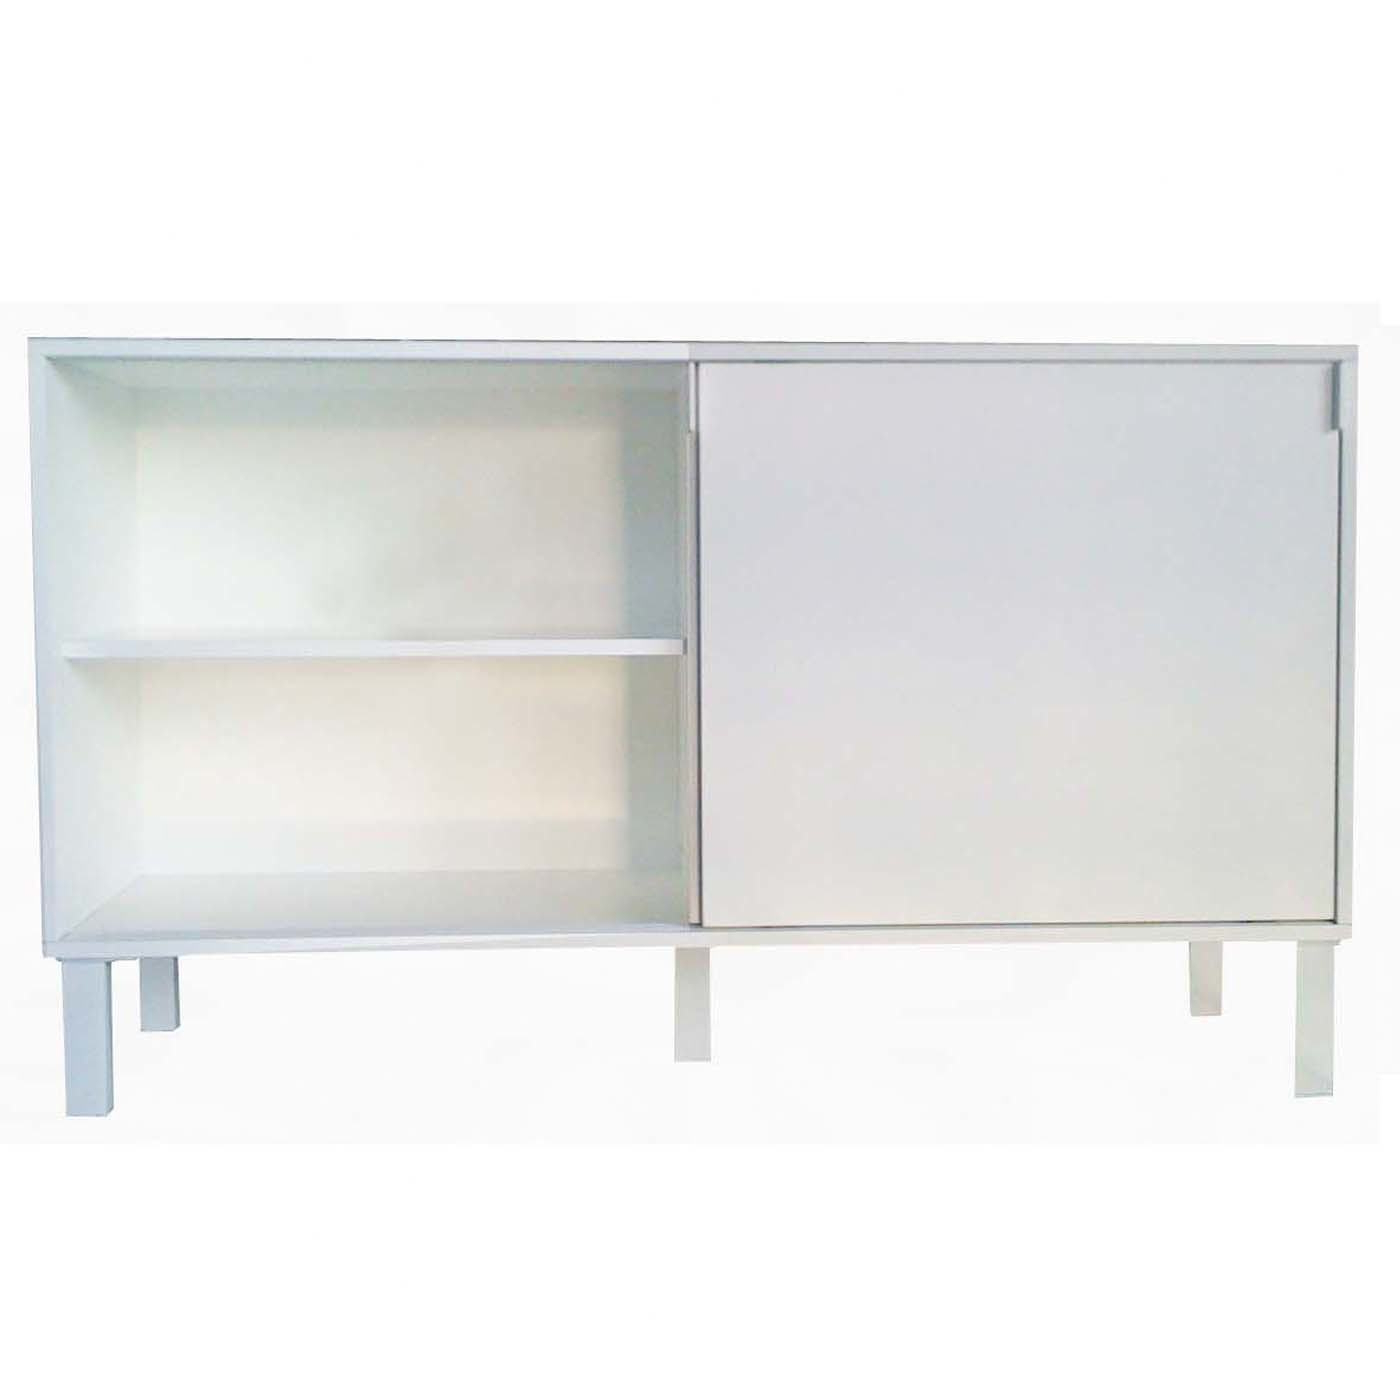 Trendy Luxurious Phoenix Group Soho Tv Cabinet Wayfair Tv Cabinets Within Soho Tv Cabinets (View 17 of 20)